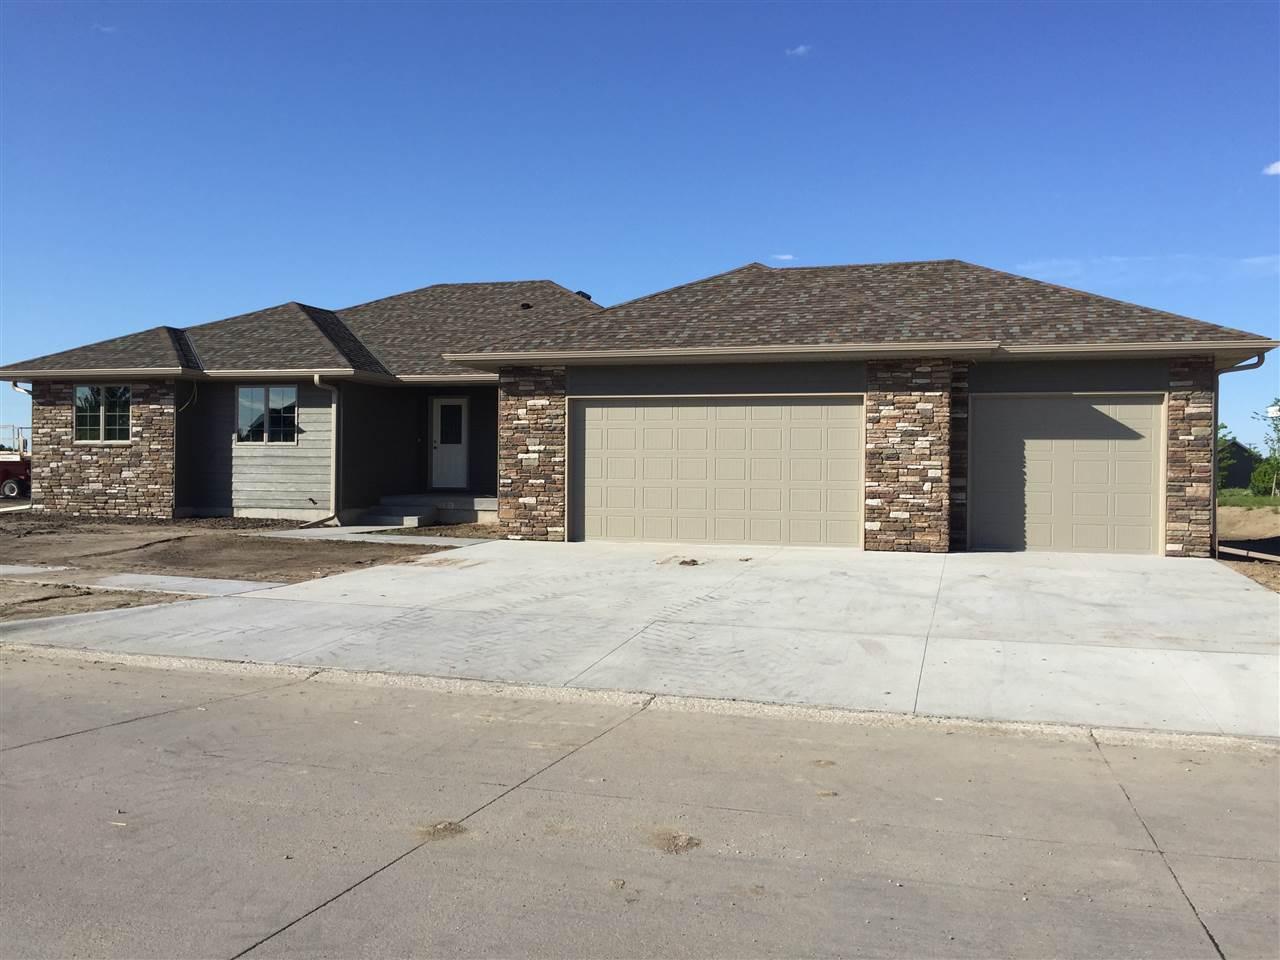 Real Estate for Sale, ListingId: 35890653, Hastings,NE68901